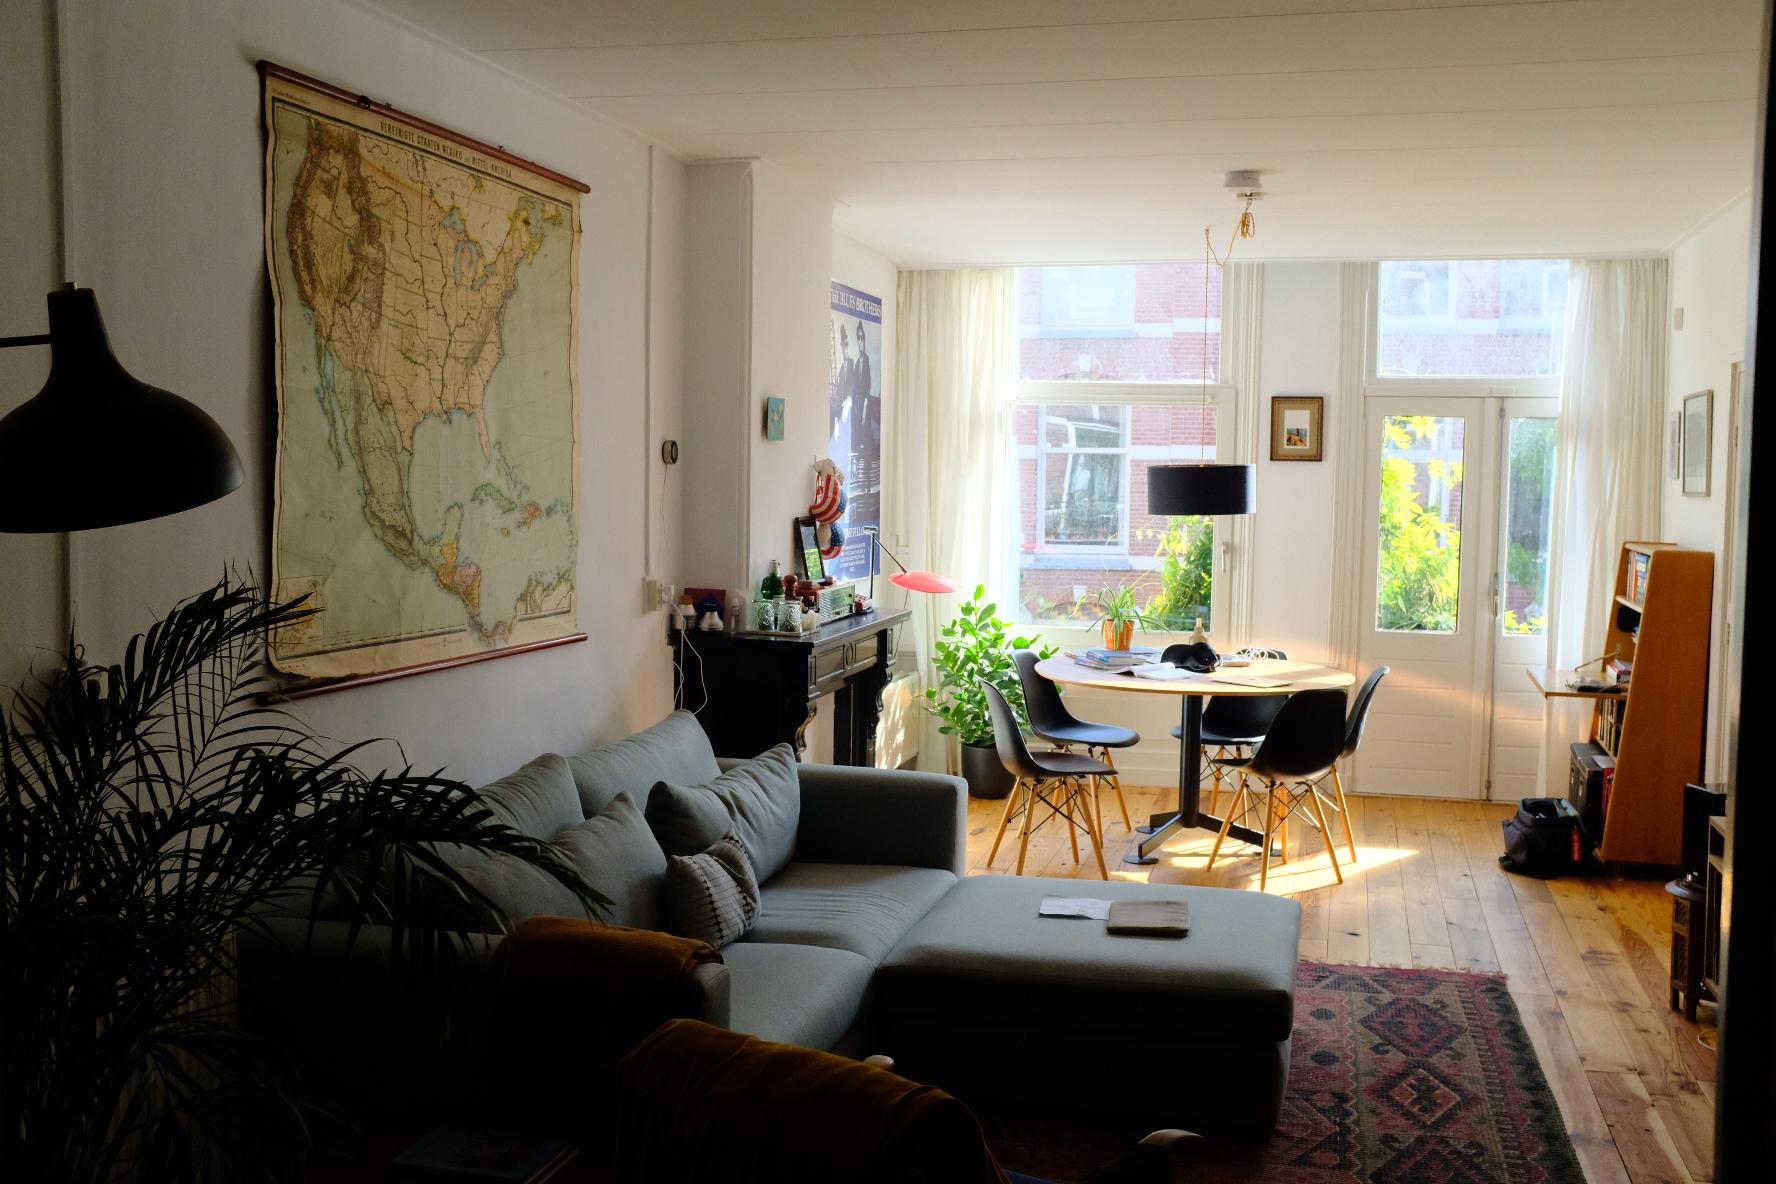 Apartment for rent - november 05 - december 16